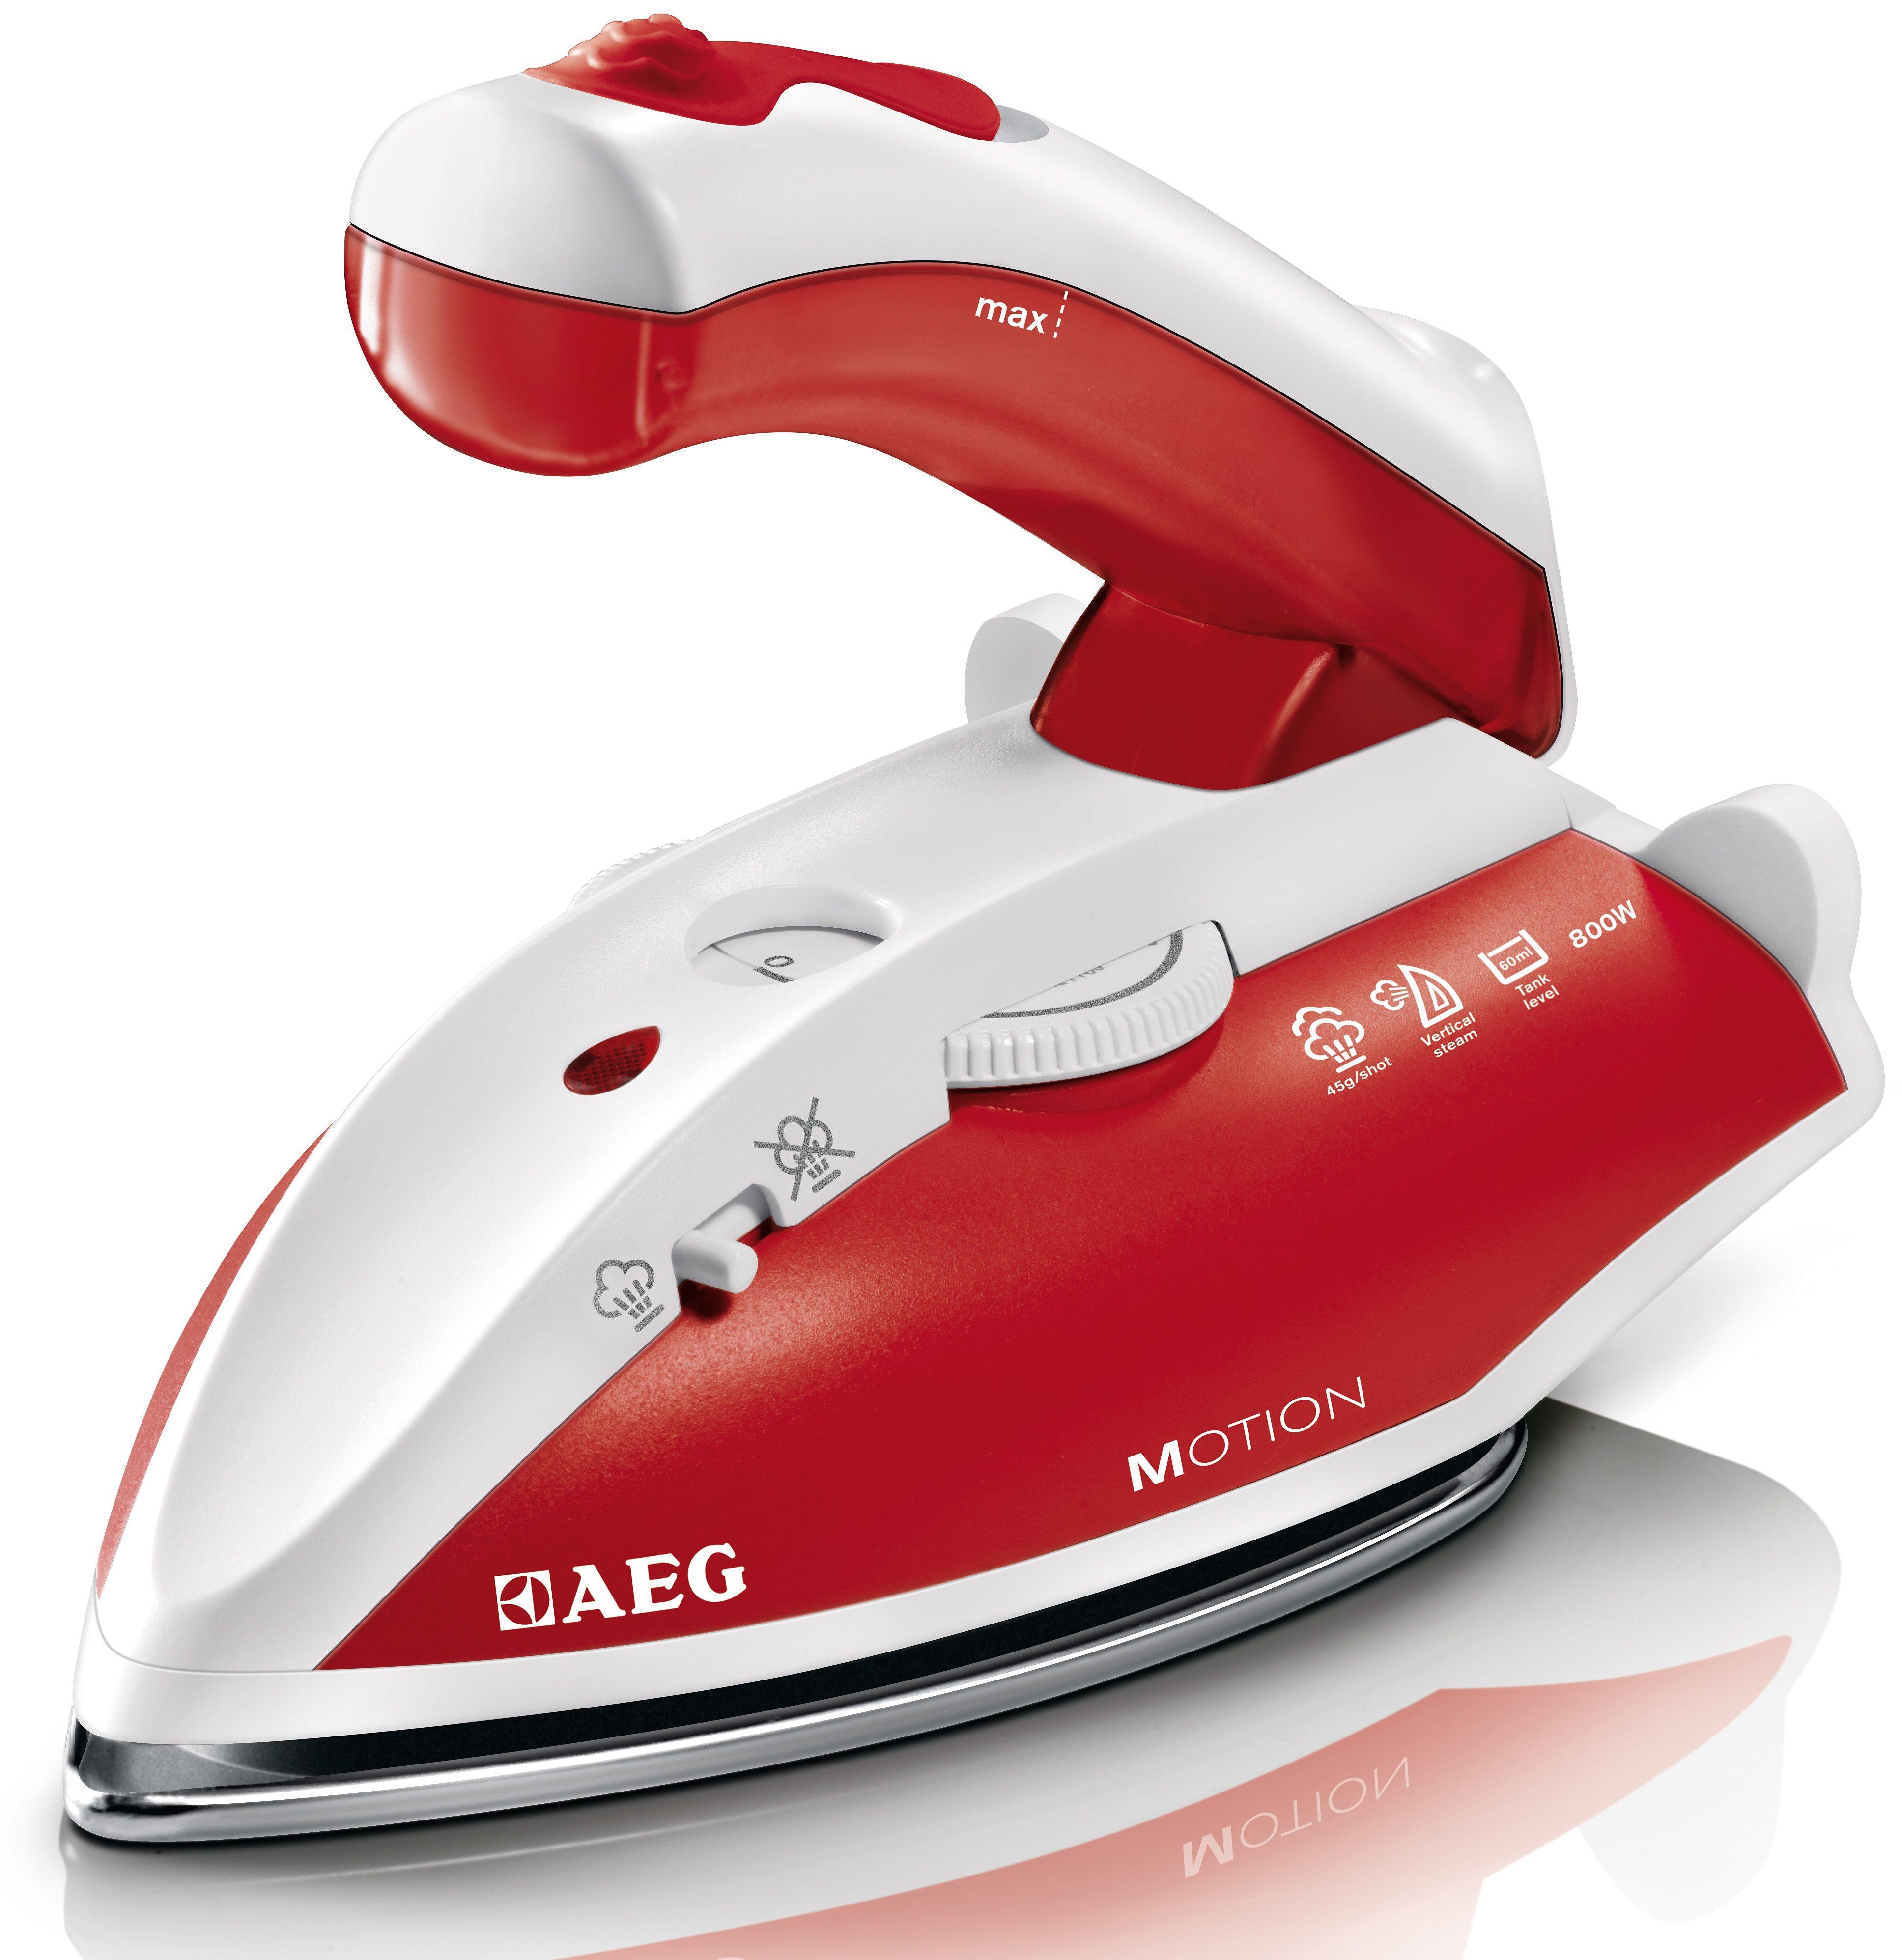 AEG Reise-Dampfbügeleisen DBT 800, 800 Watt | Flur & Diele > Haushaltsgeräte > Bügeleisen | Rot | Edelstahl | AEG